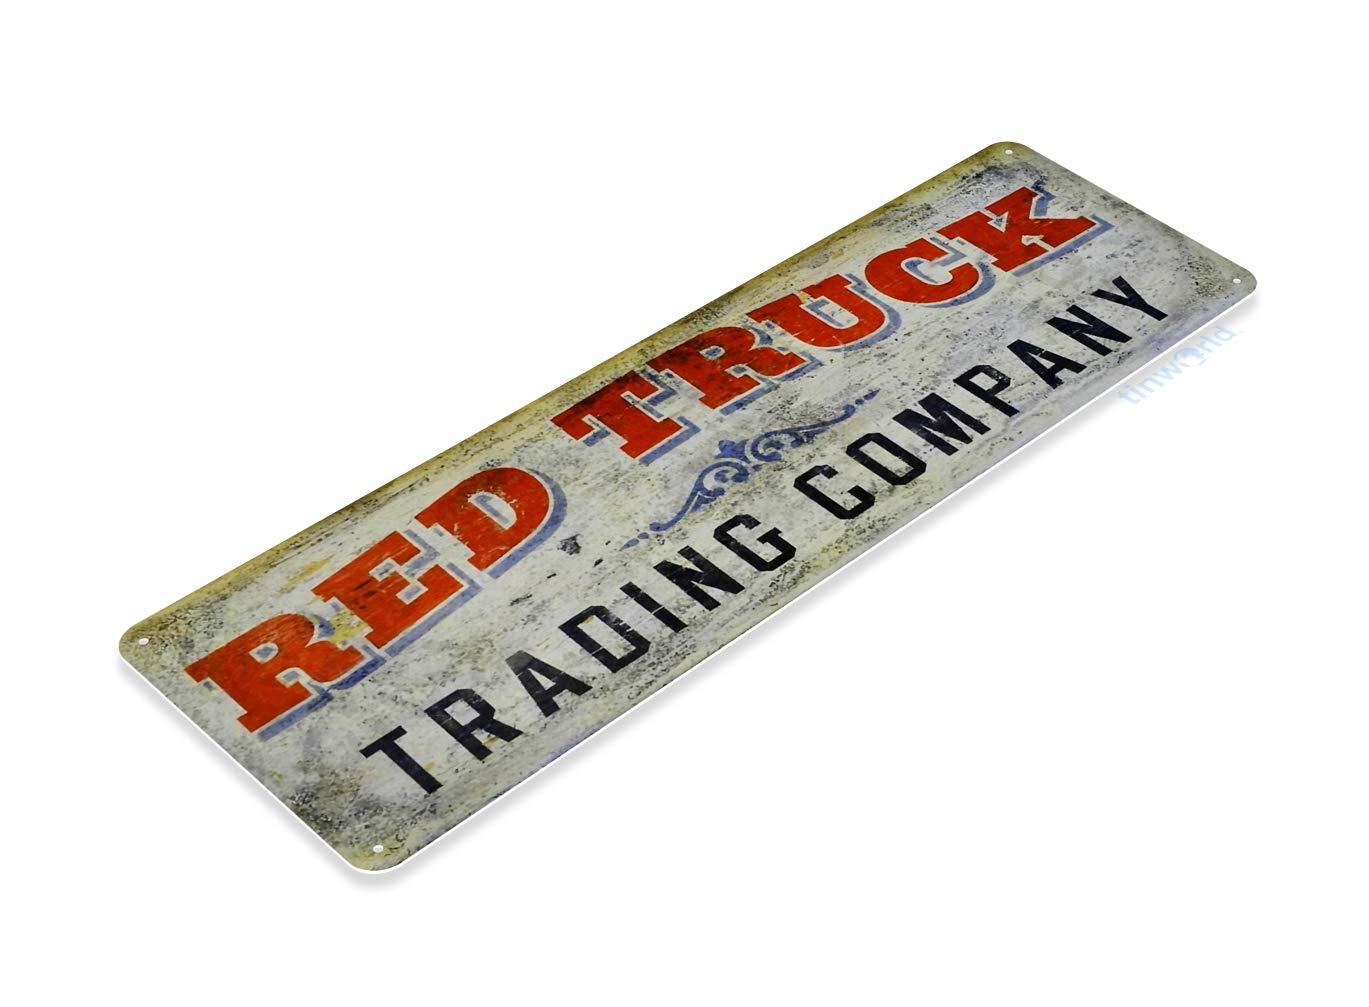 Tinworld Tin Sign Red Truck Trading Company Retro Rustic Auto Shop Garage Metal Sign Decor B583